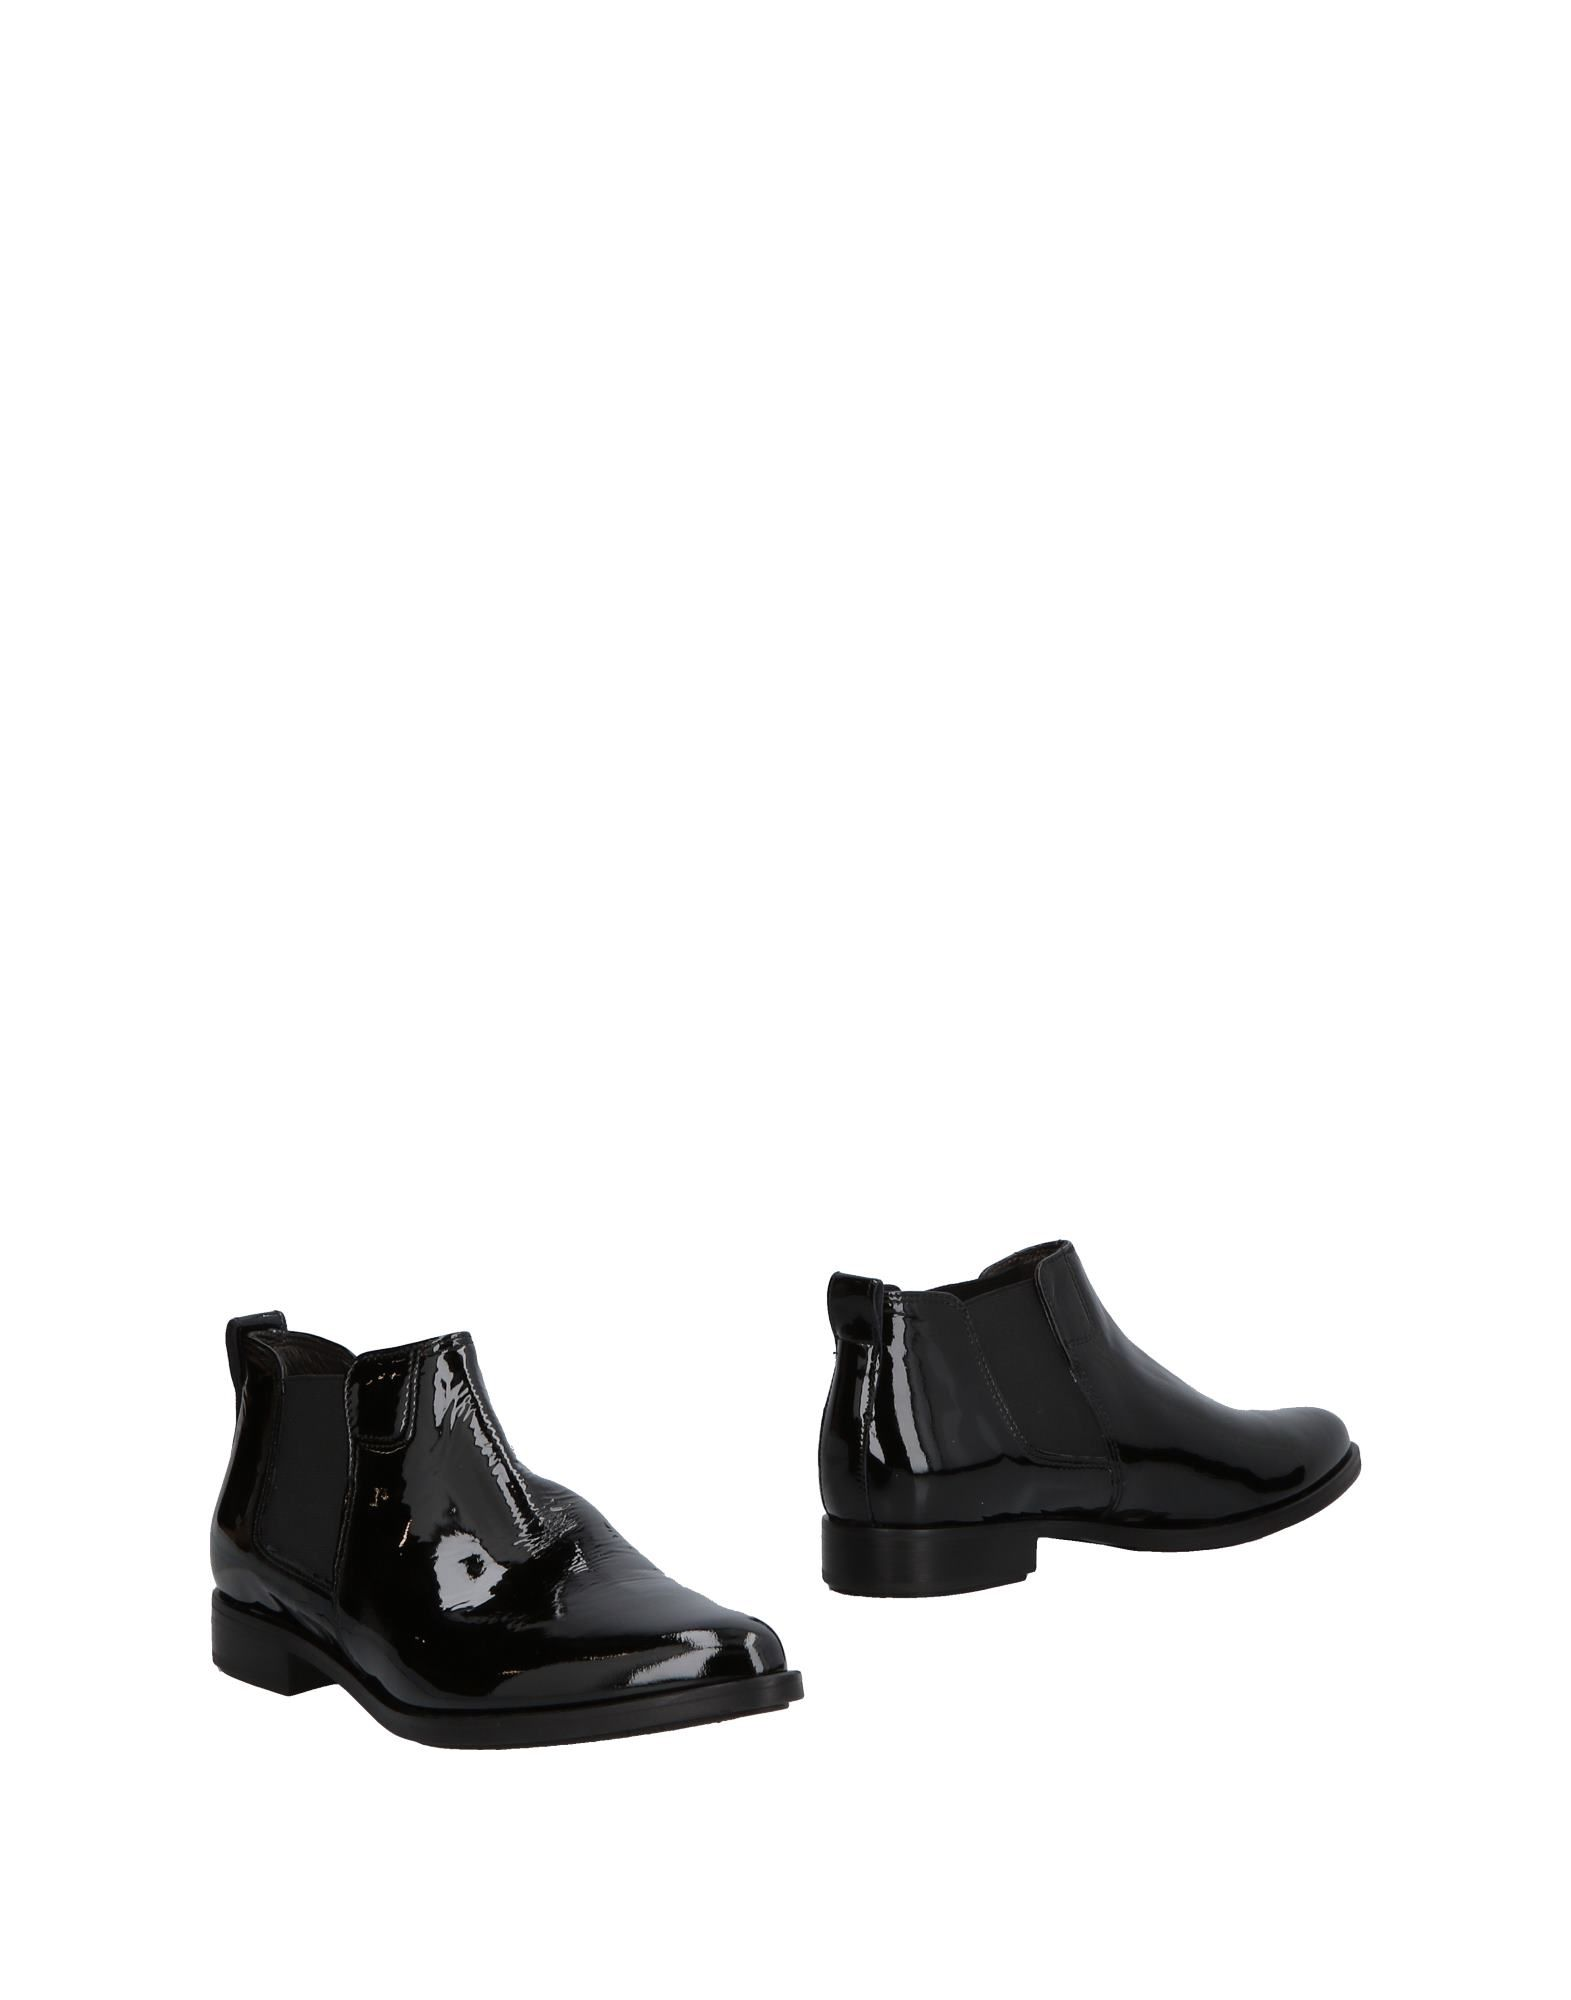 Chelsea Boots 11496864VJ Marco Ferretti Donna - 11496864VJ Boots d9b5c9